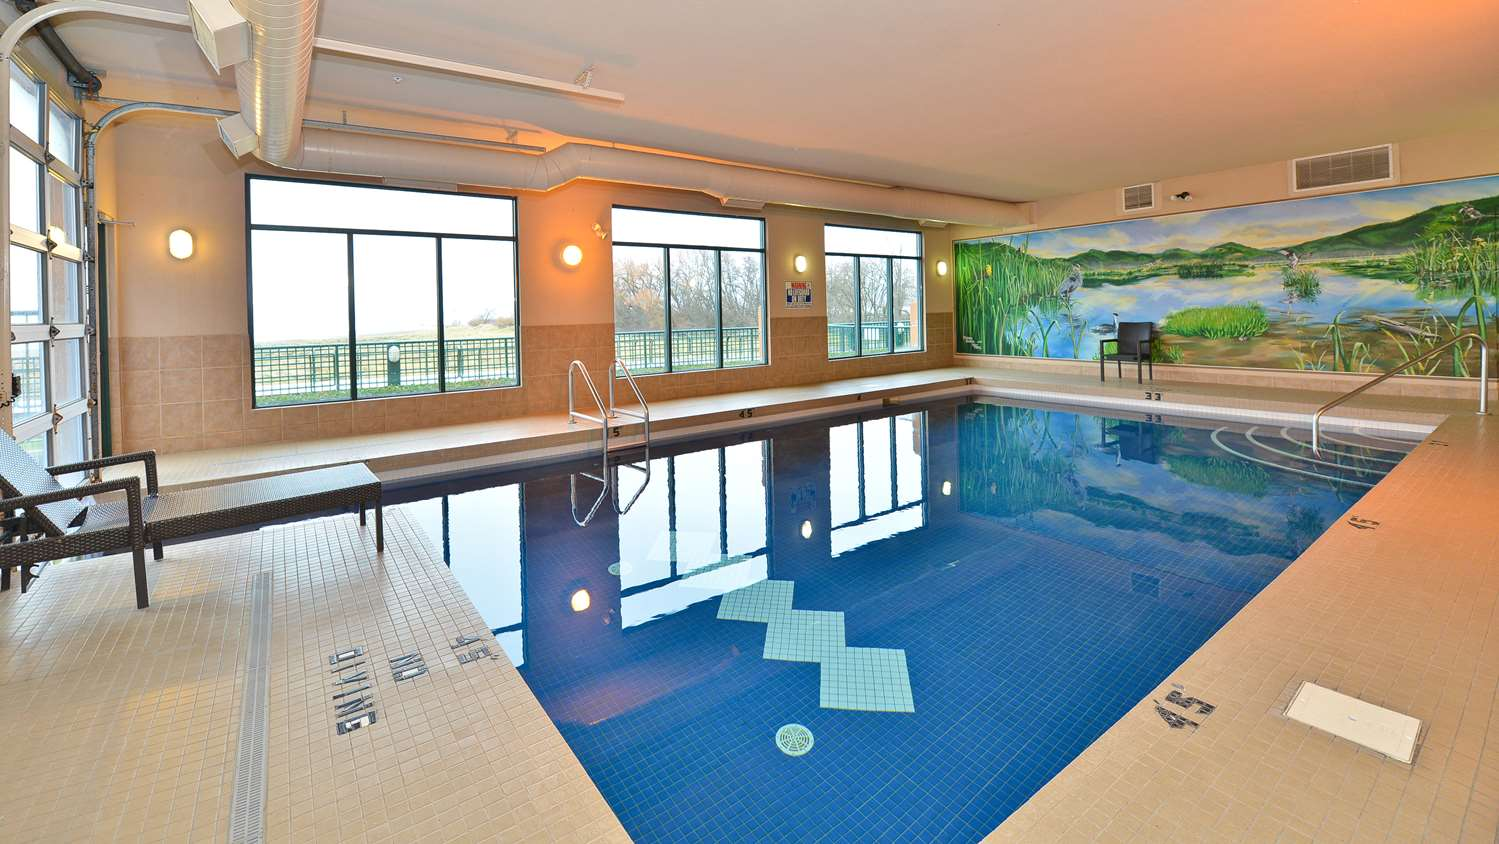 Pool - Prestige Harbourfront Resort Salmon Arm